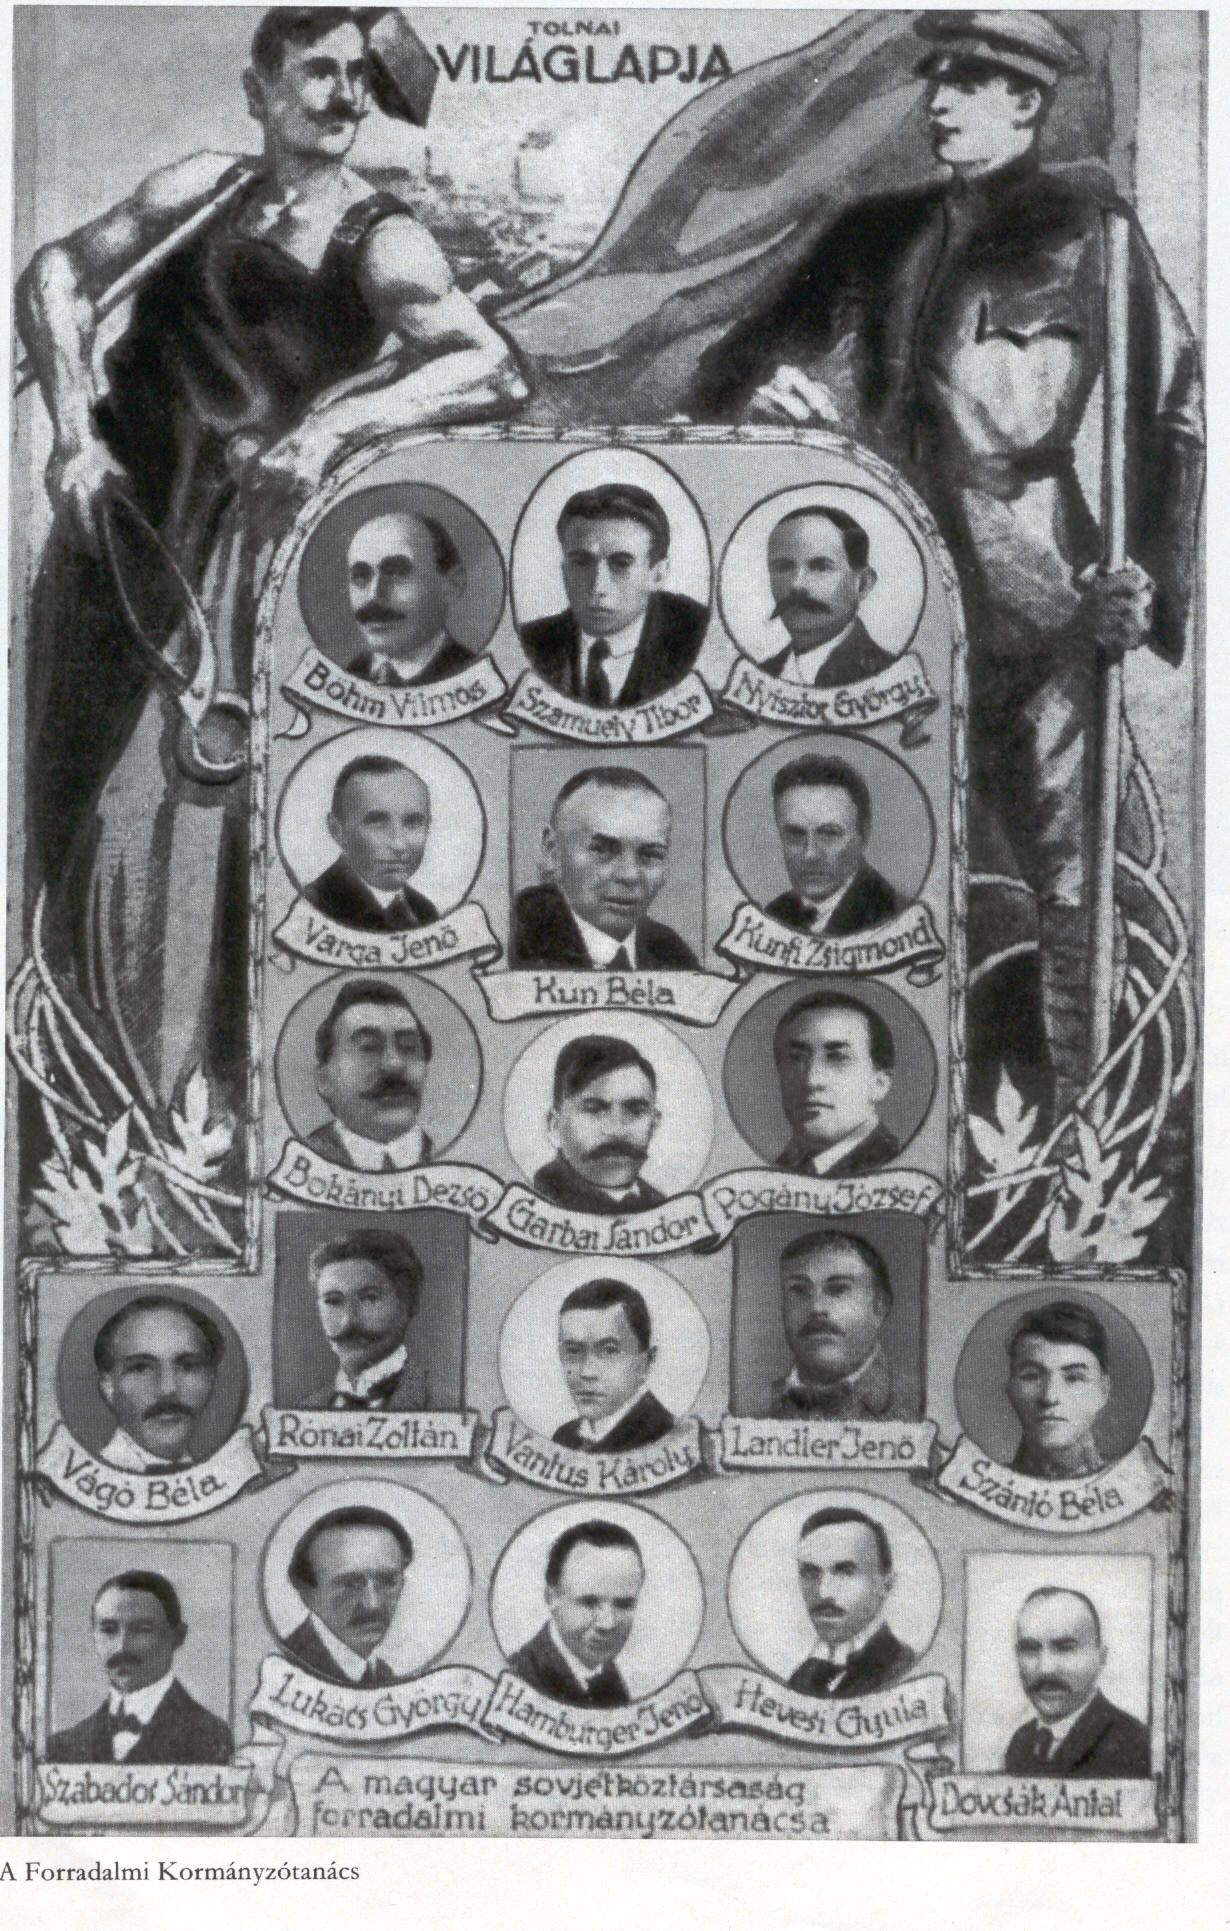 Räteregierung 1919. Jennö Varga links v. Béla Kun (gemeinfrei)